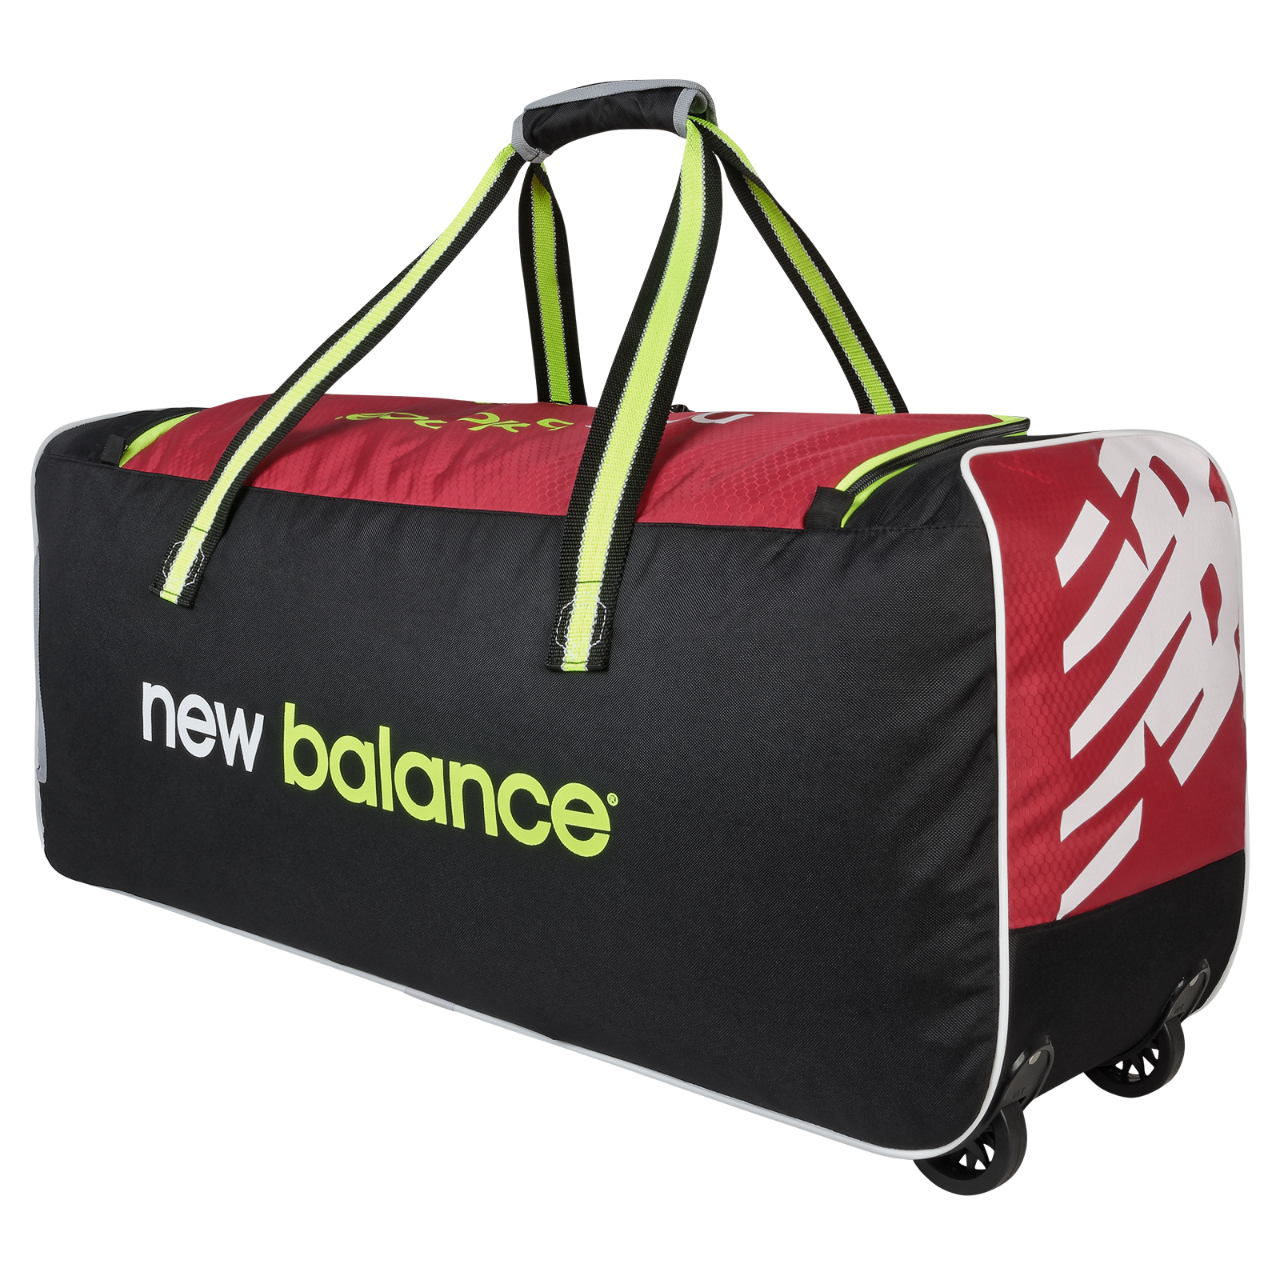 2020 New Balance TC 560 Wheelie Cricket Bag